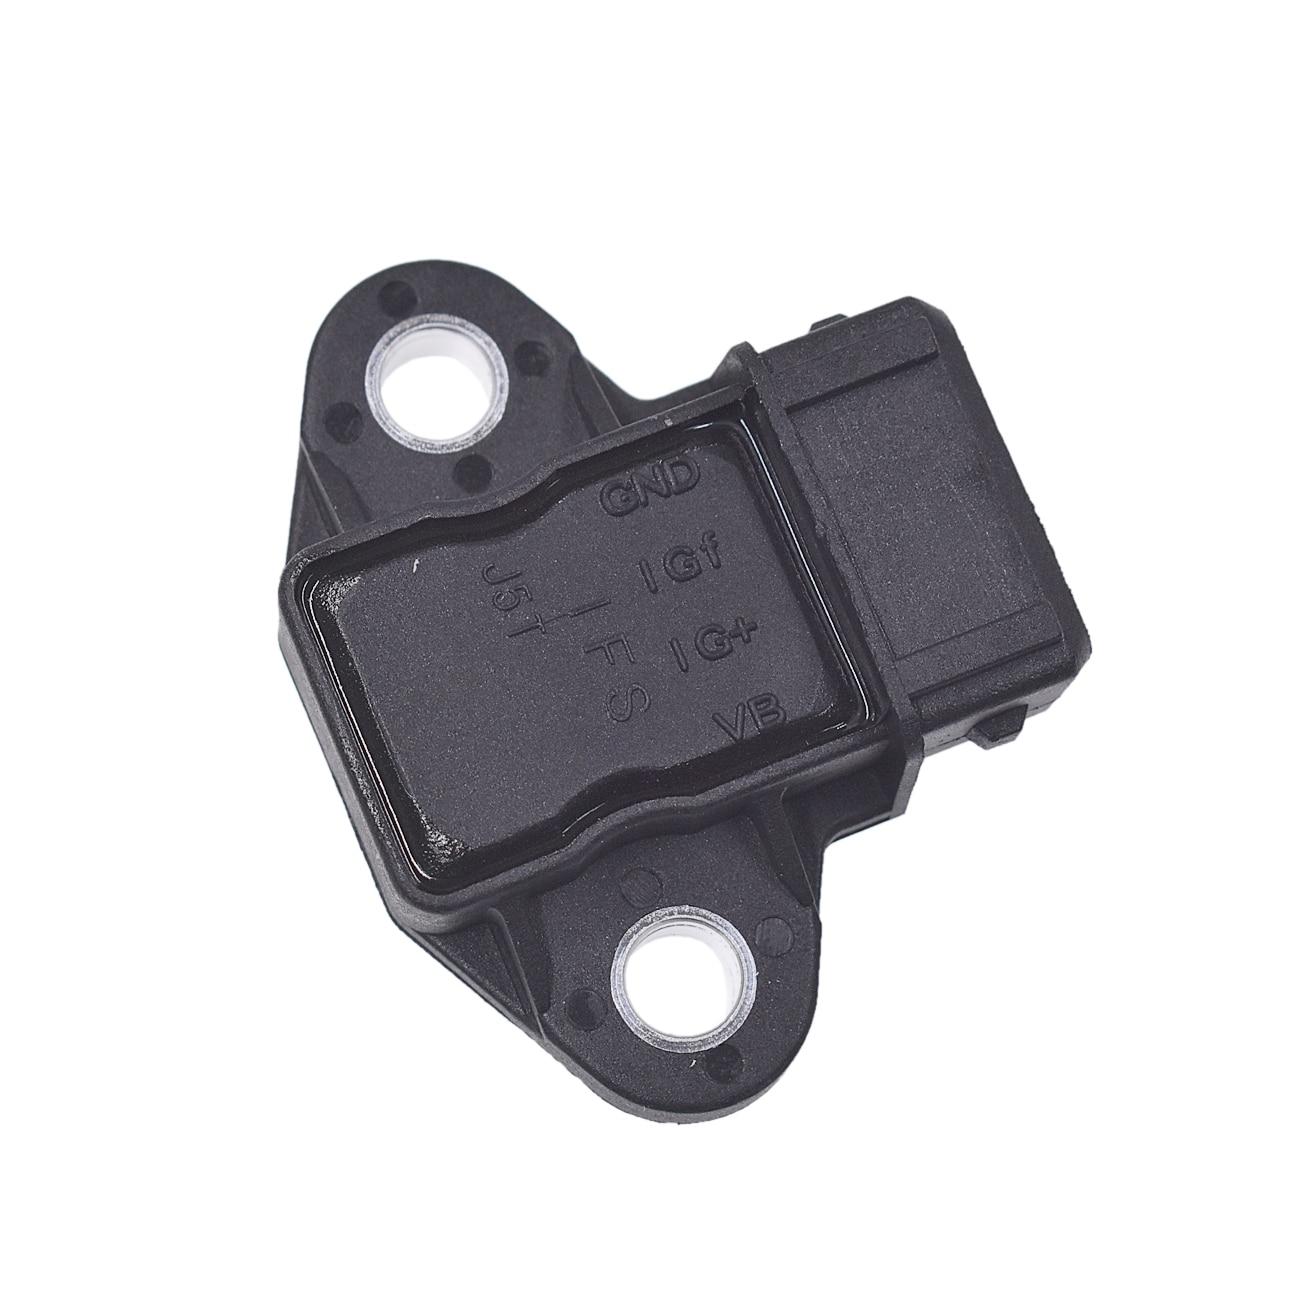 Pouvoir Misfire Sensor Control Module Igniter For Mitsubishi MD374437 J5T 60572